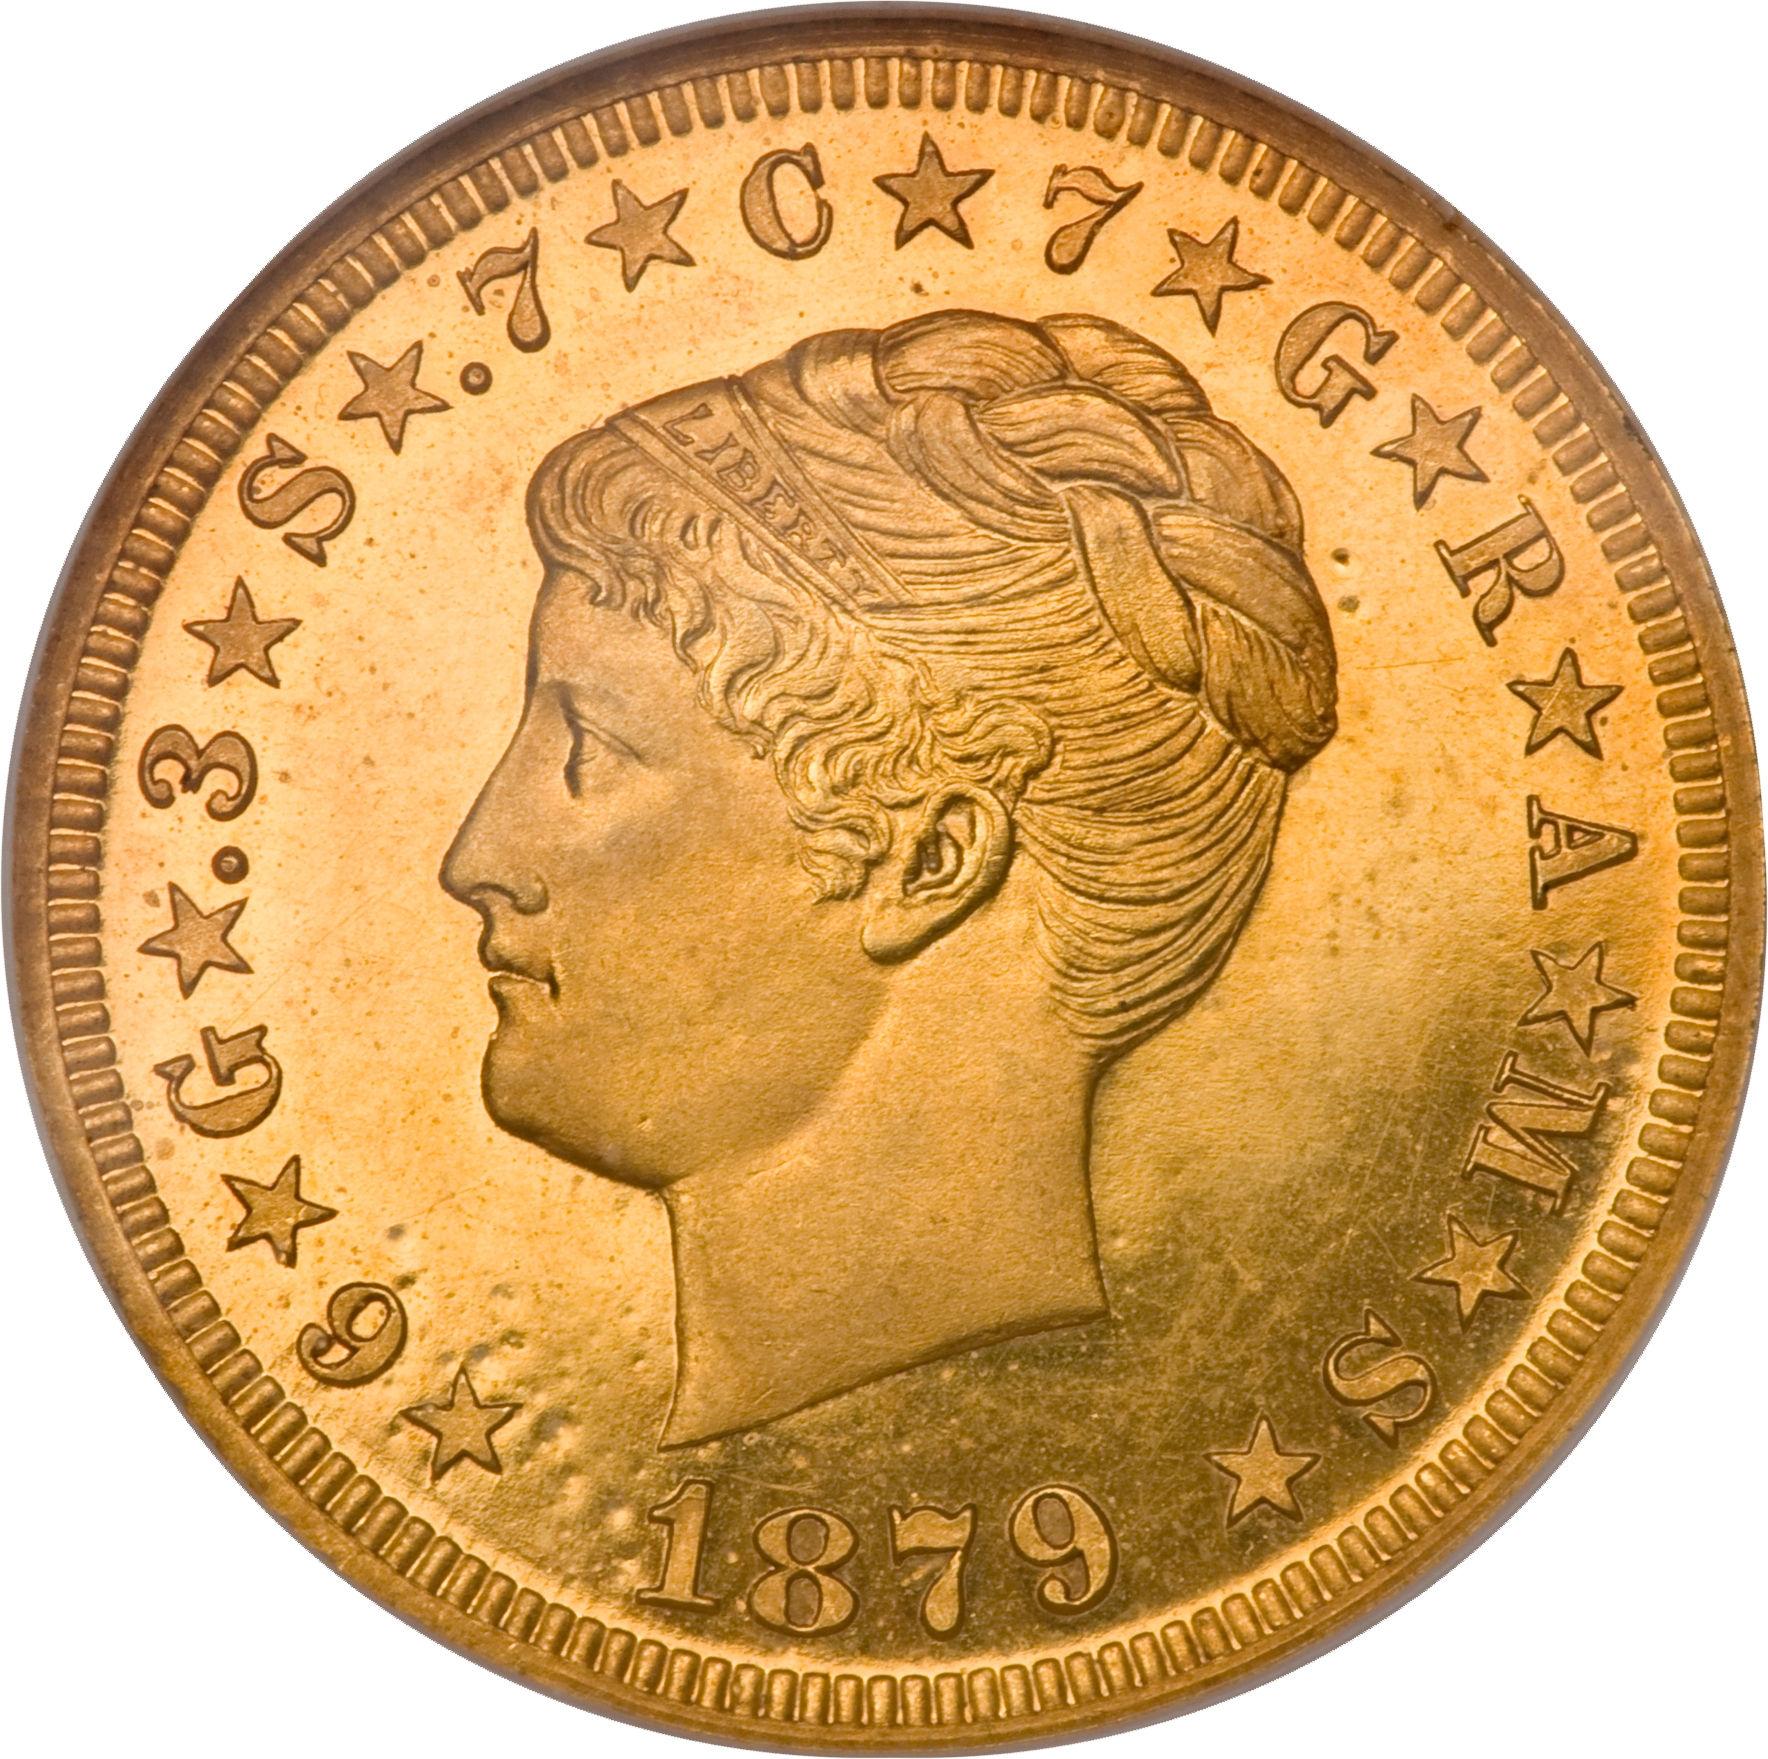 4 Dollars Quot Stella Quot Pattern United States Numista